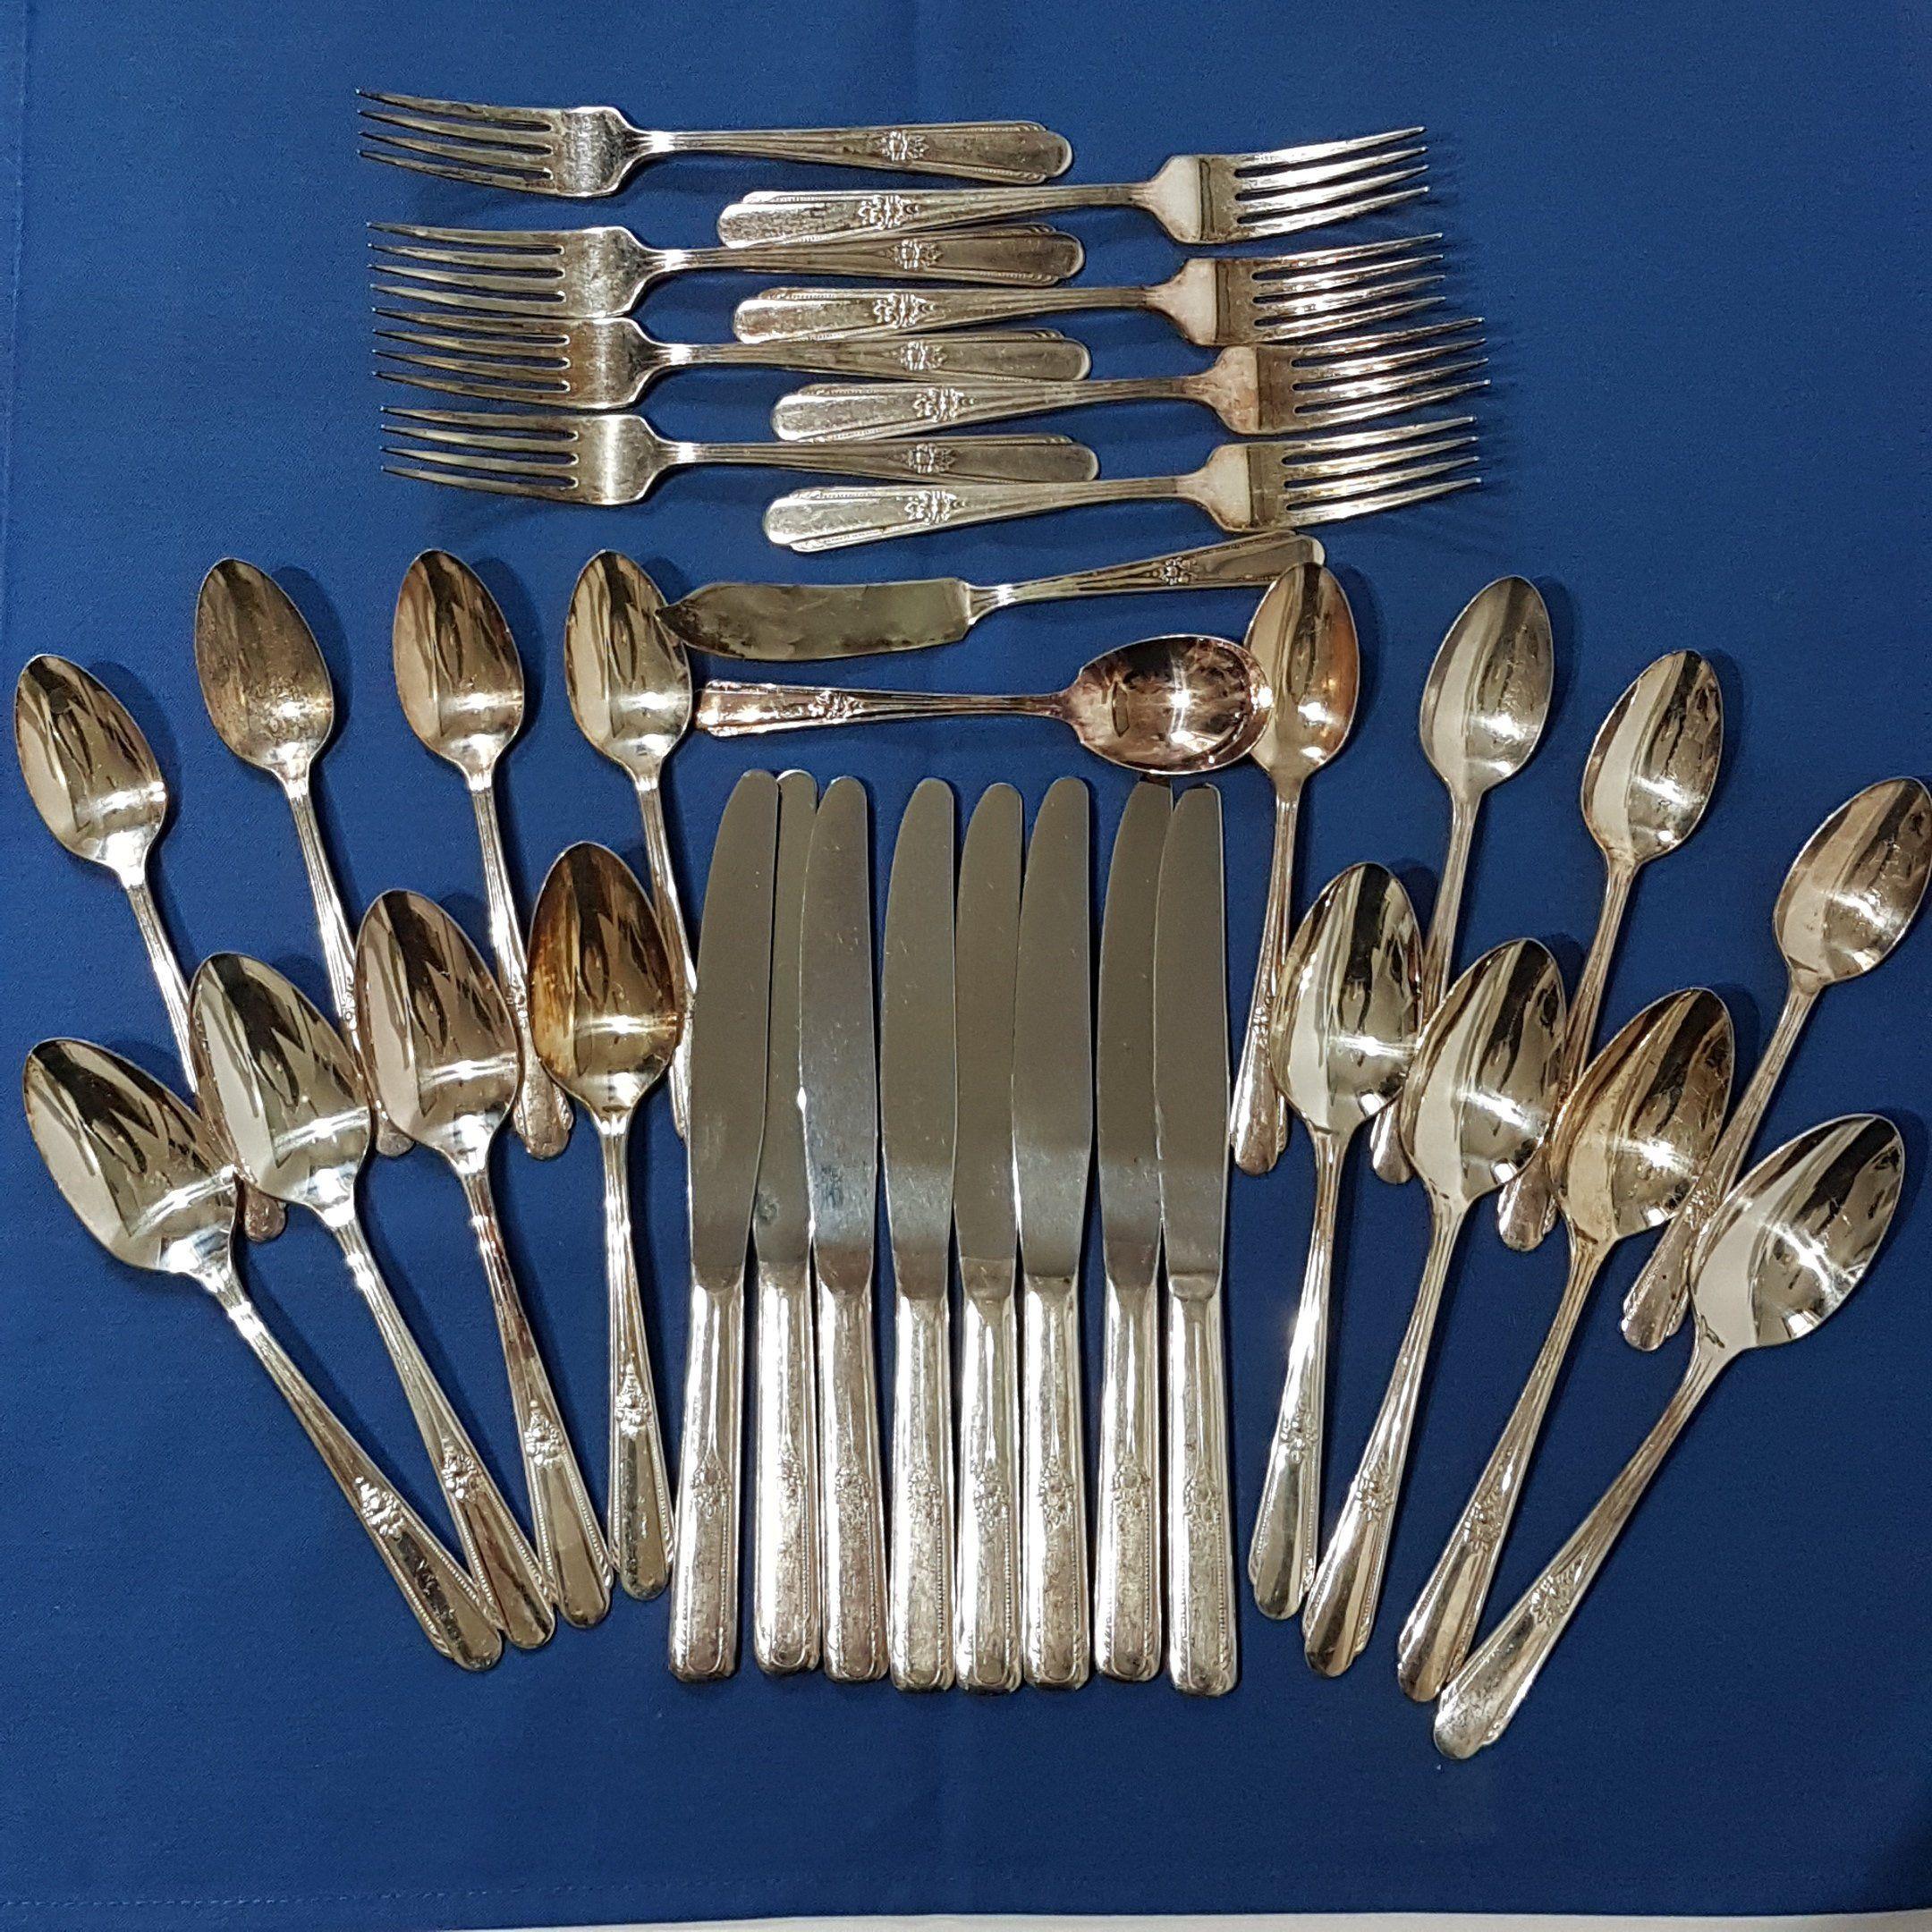 Vintage Wm Rogers Long Handle Forks Original Rogers 7 12  Silver Plate